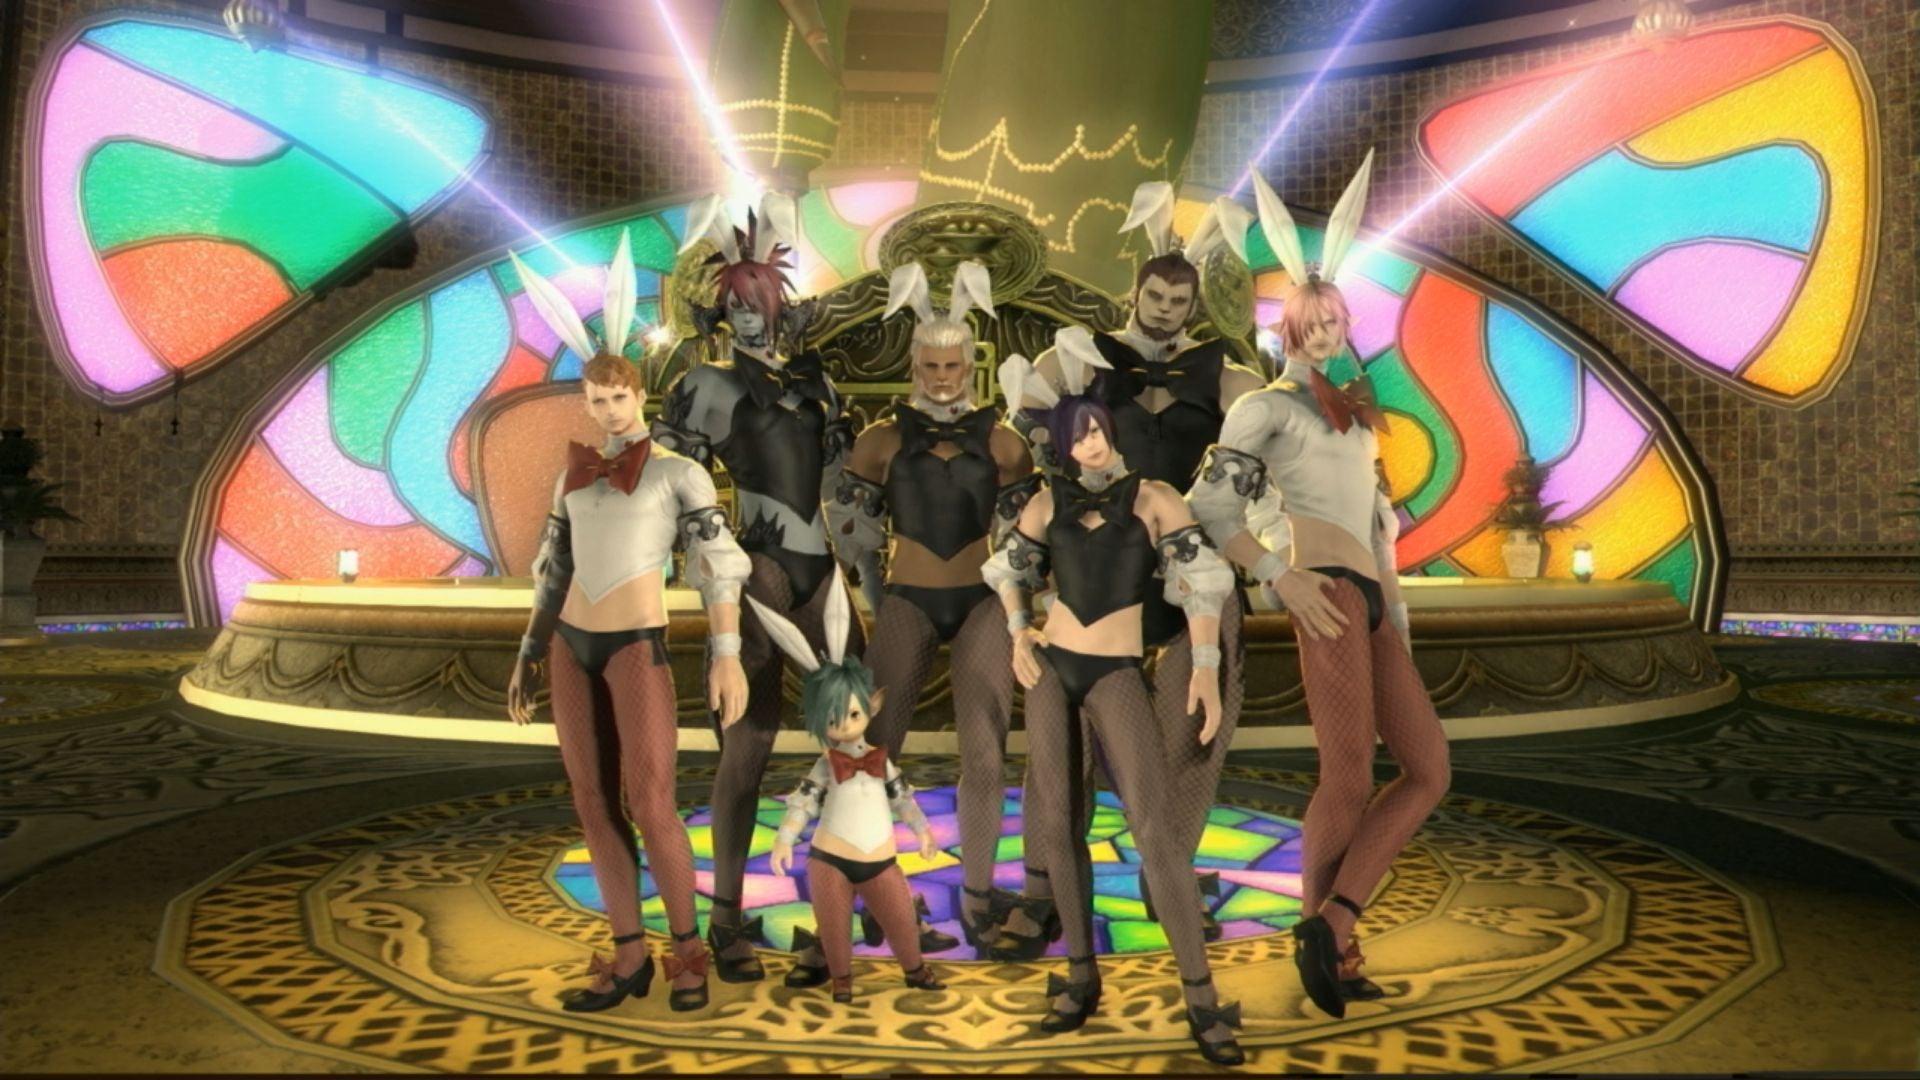 Discord Pulls Popular Final Fantasy Server's Partner Status Over NSFW Content